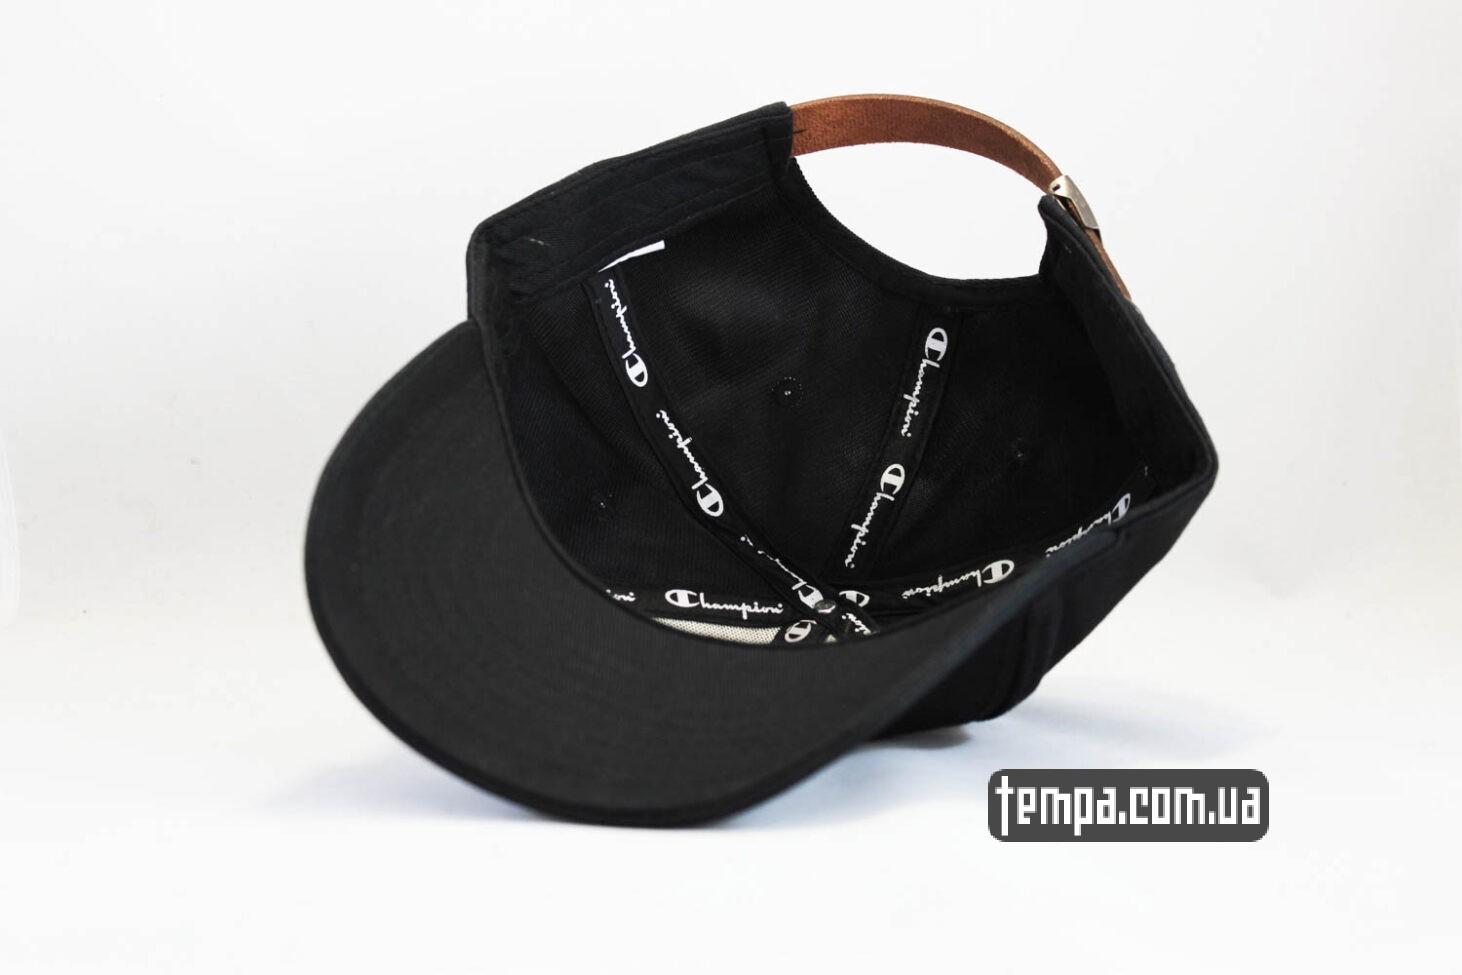 чемпион одежда кепка бейсболка Champion черная логотип сбоку-2